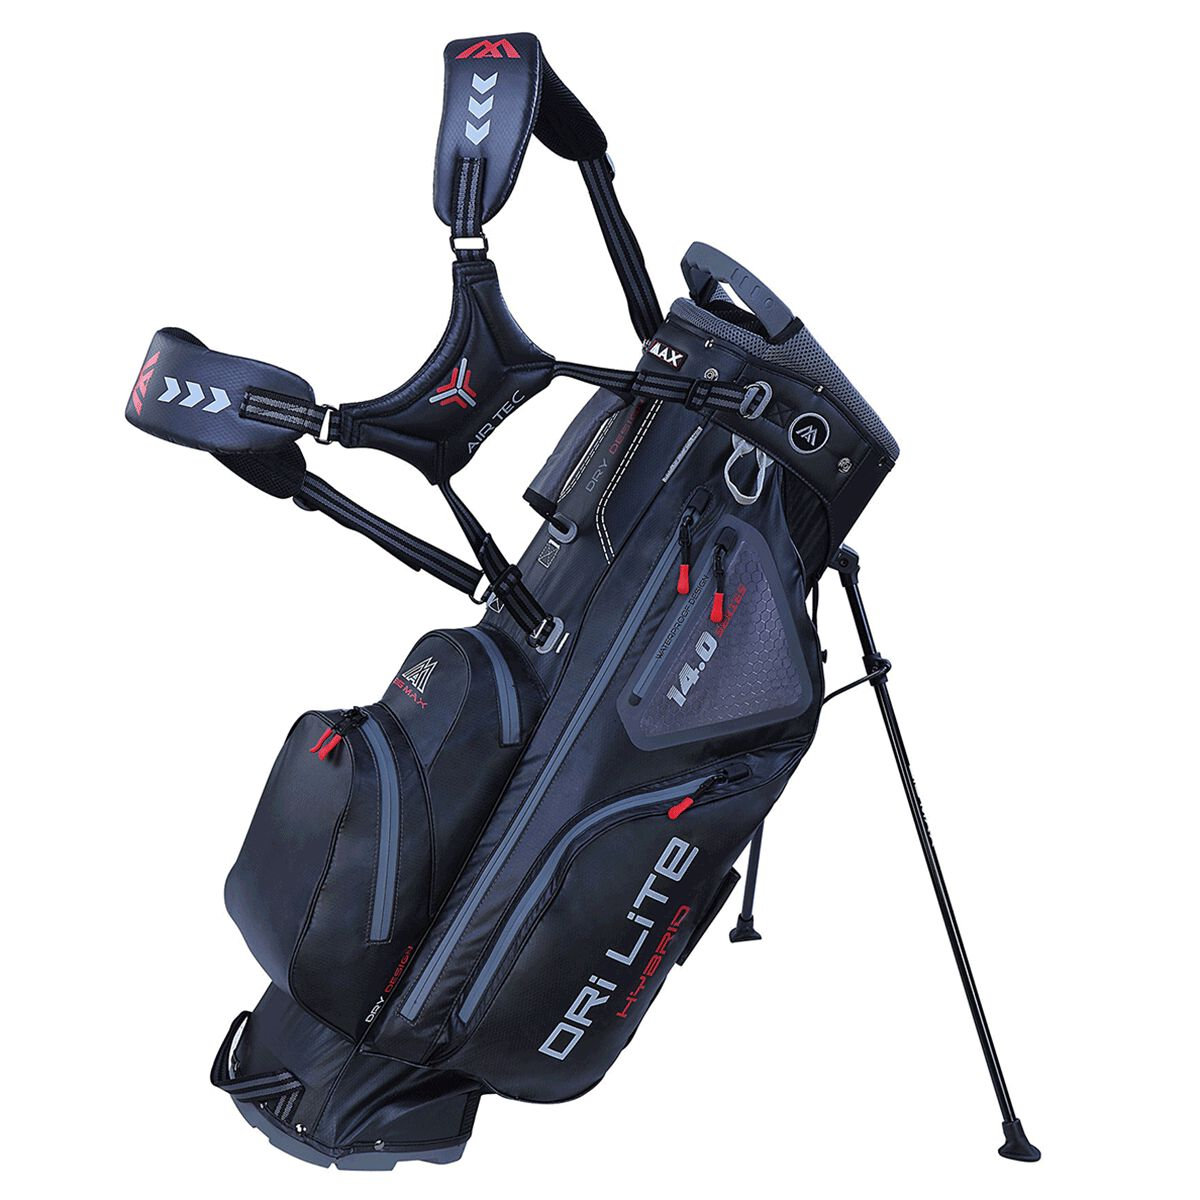 BIG MAX DRI LITE Hybrid Golf Stand Bag, Black | American Golf